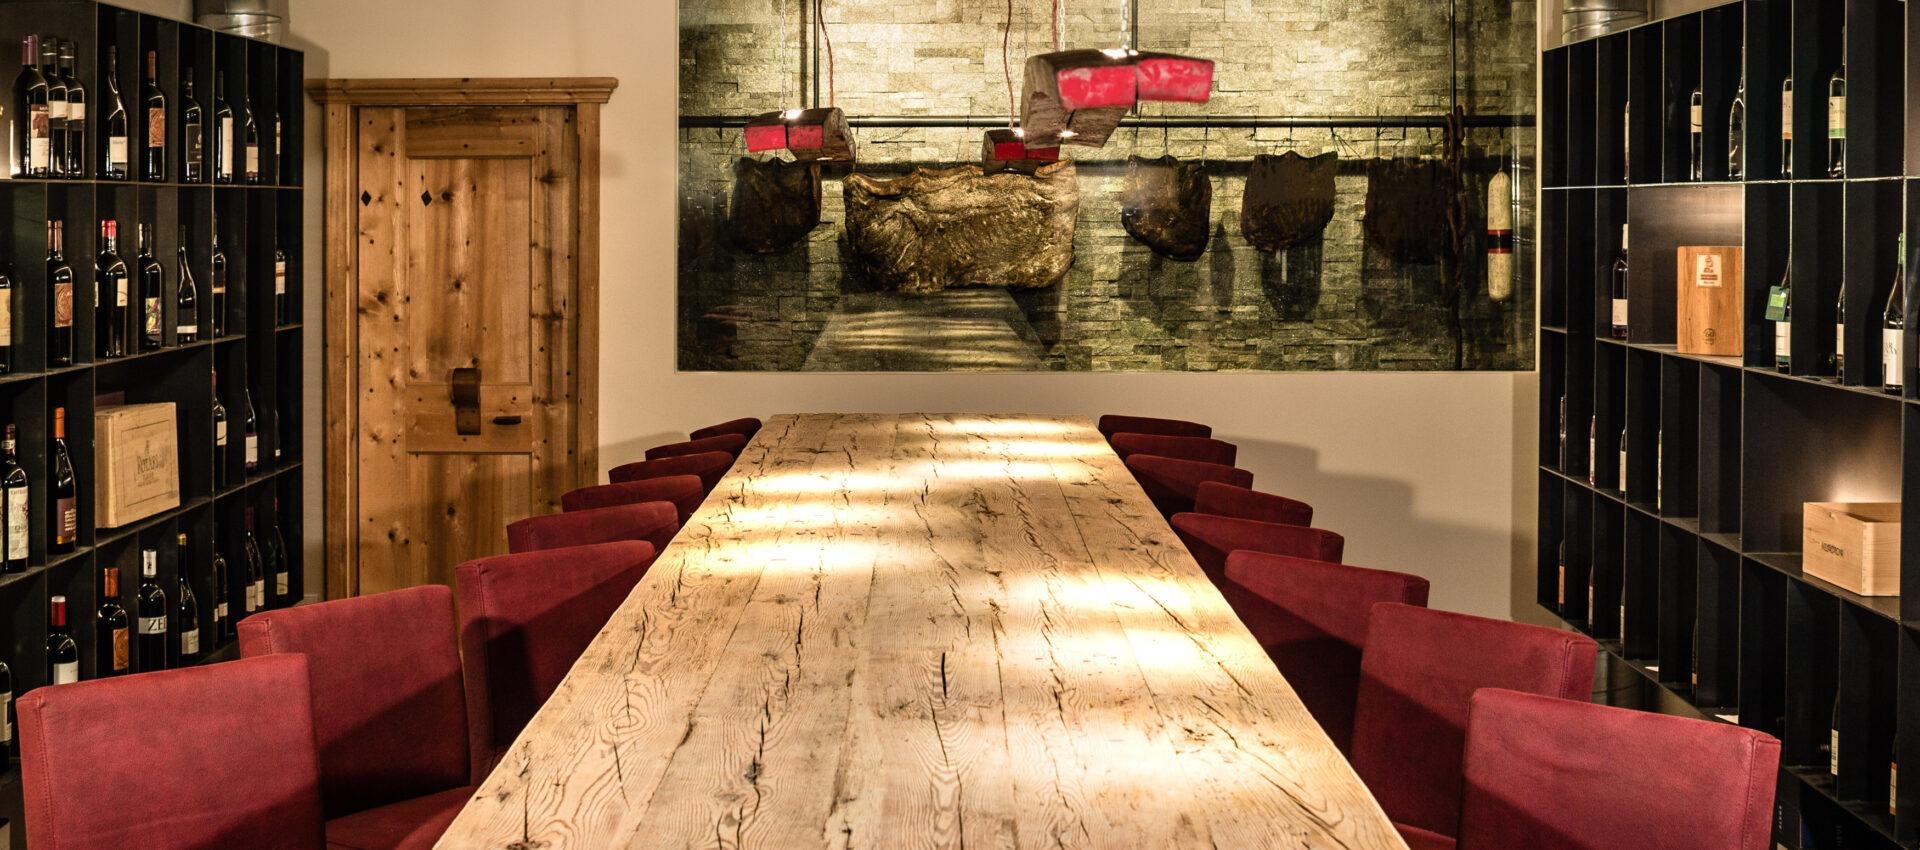 Weinkeller 4 Sterne Hotel in Lana Pfeiss - Meran - Südtirol